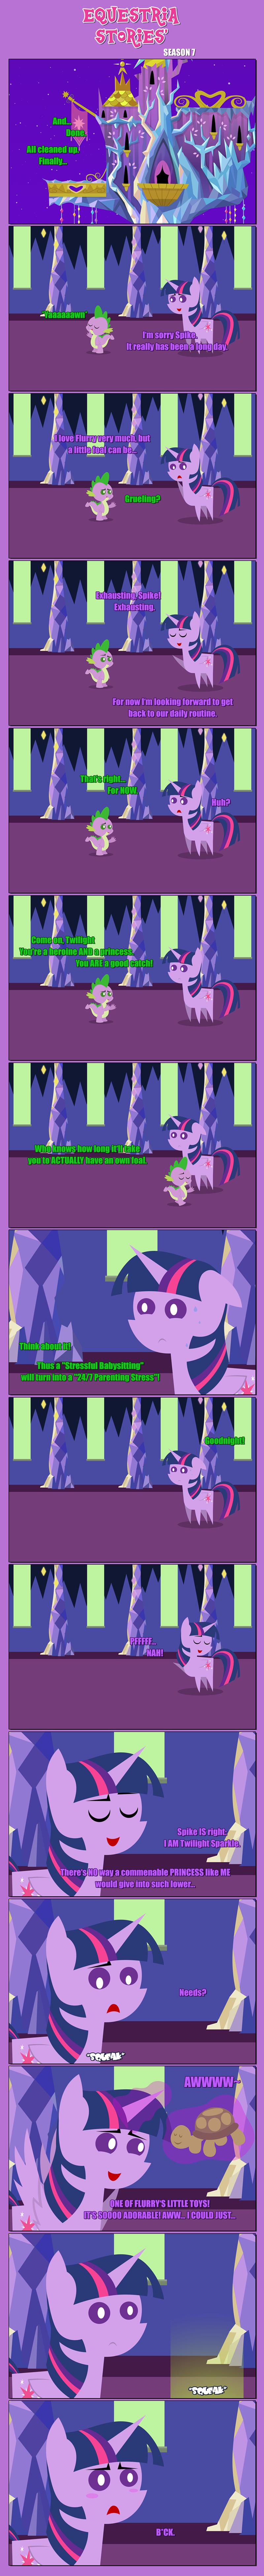 spike twilight sparkle estories comic a flurry of emotions - 9029908480